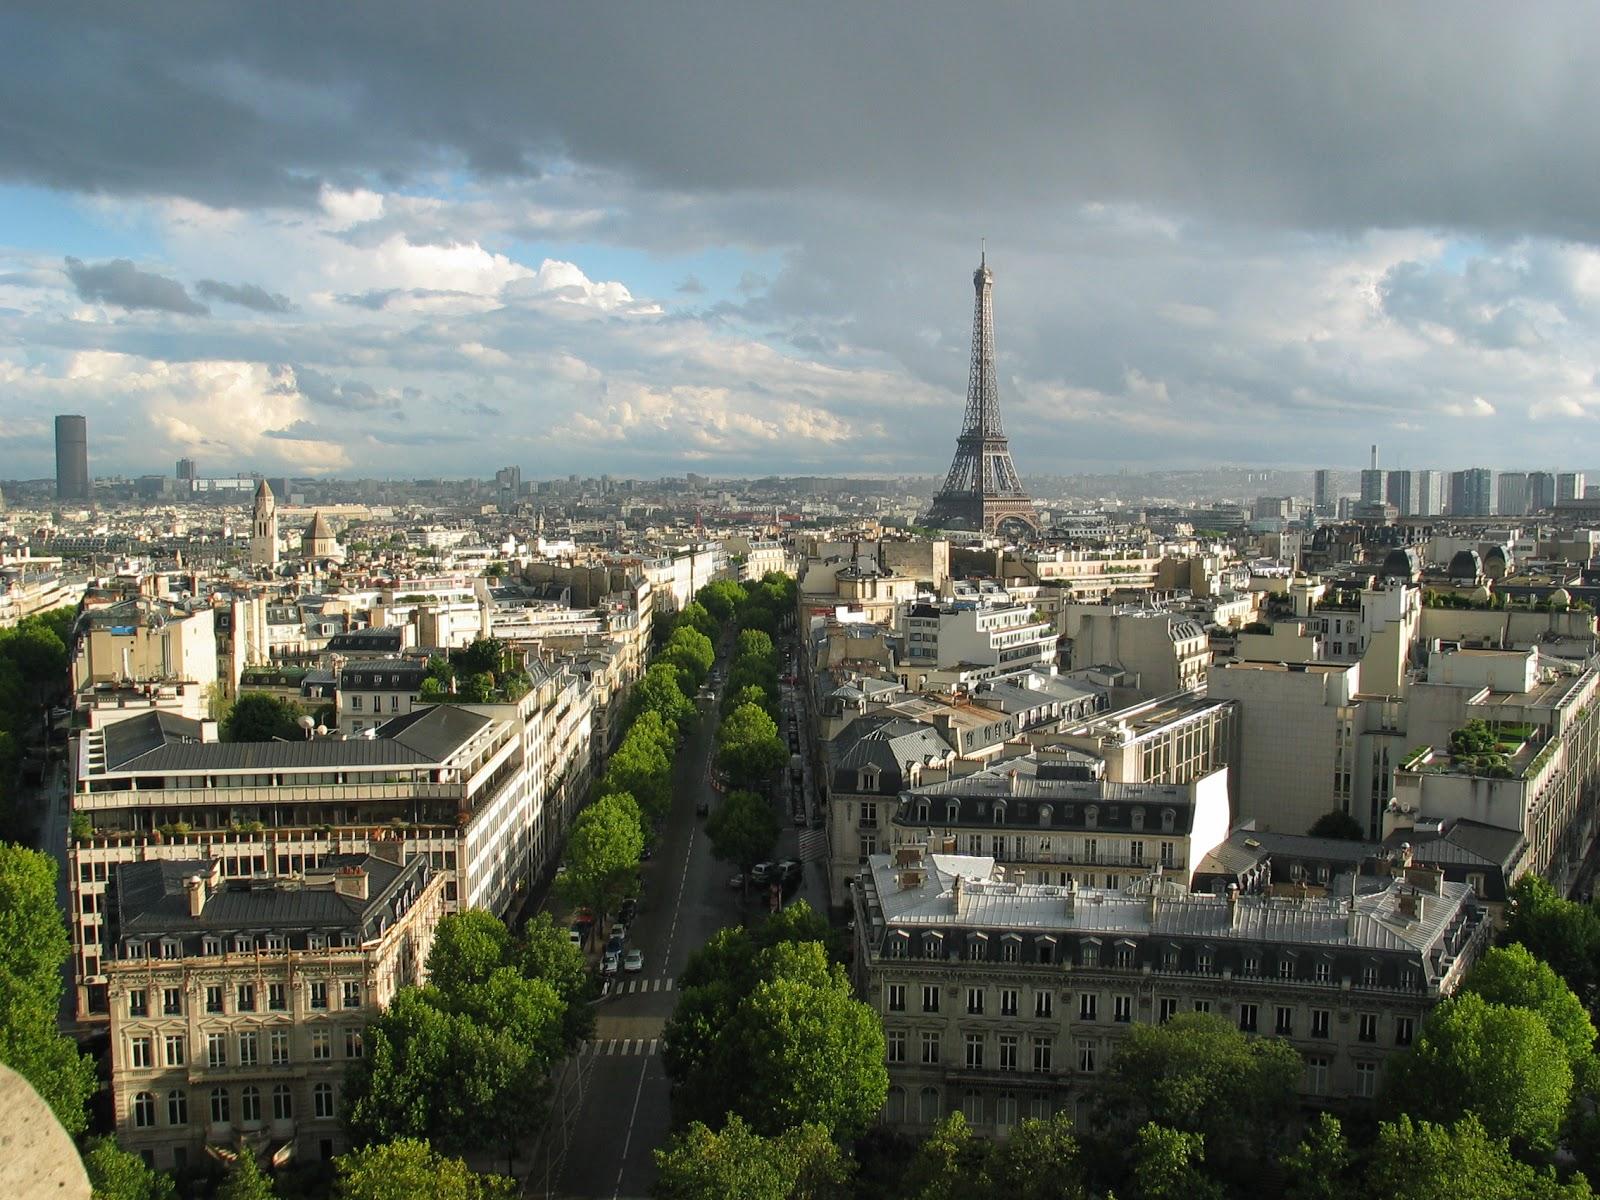 paris city street hd - photo #23